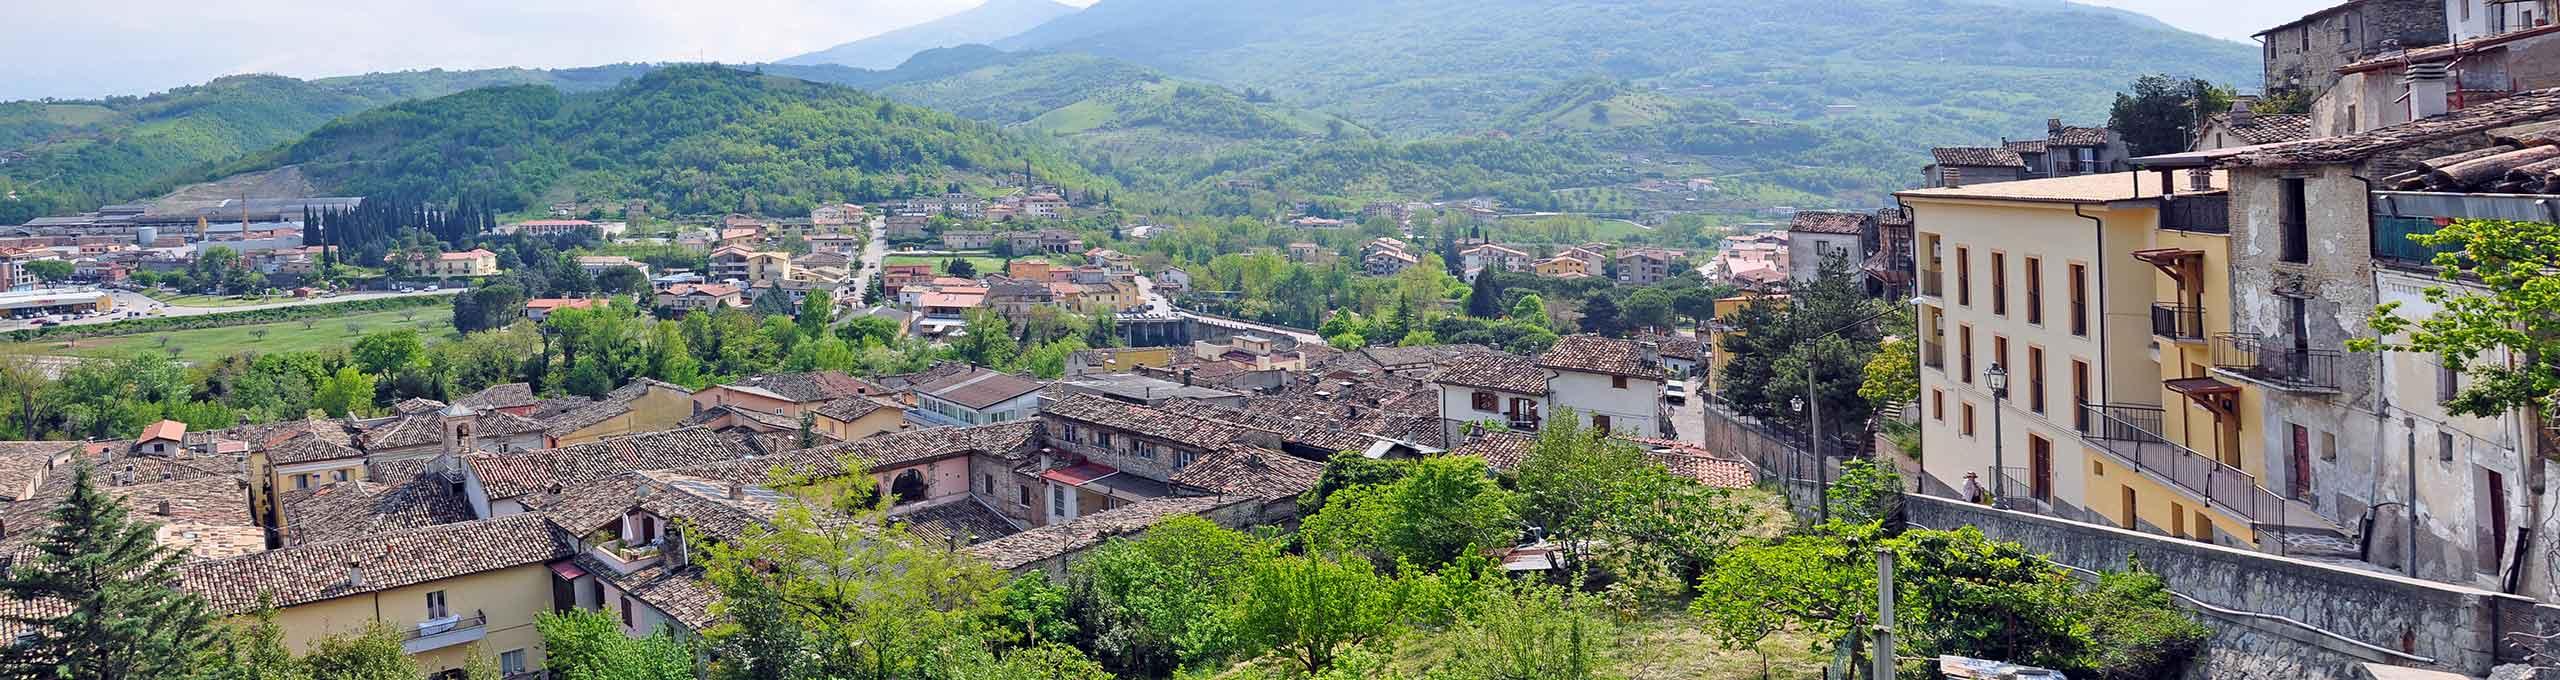 Montorio al Vomano, Gran Sasso